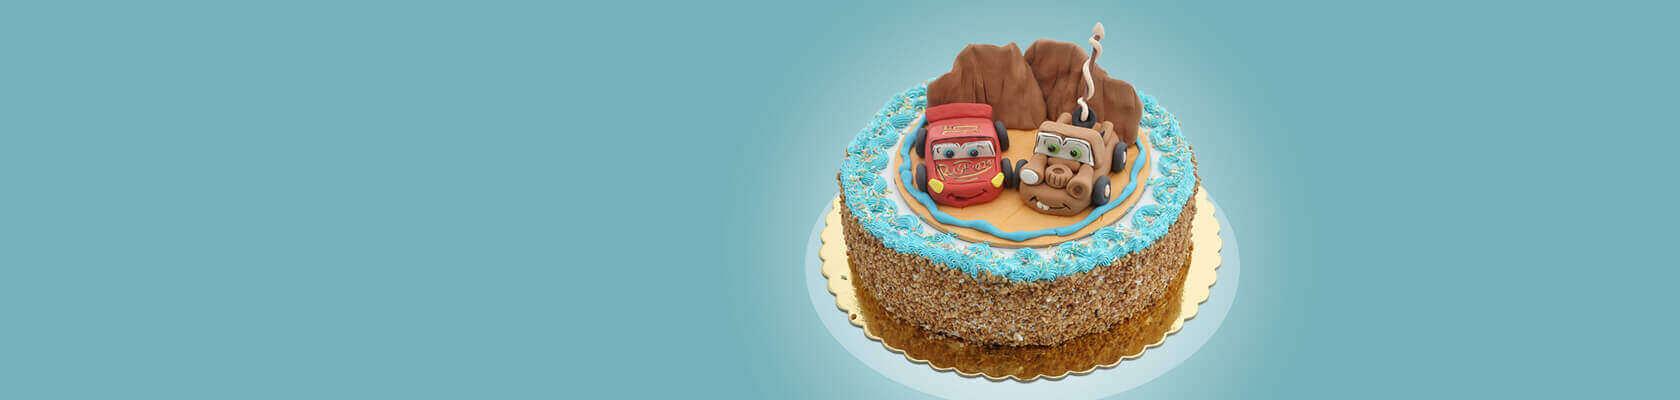 detski-torti-slide-1680px